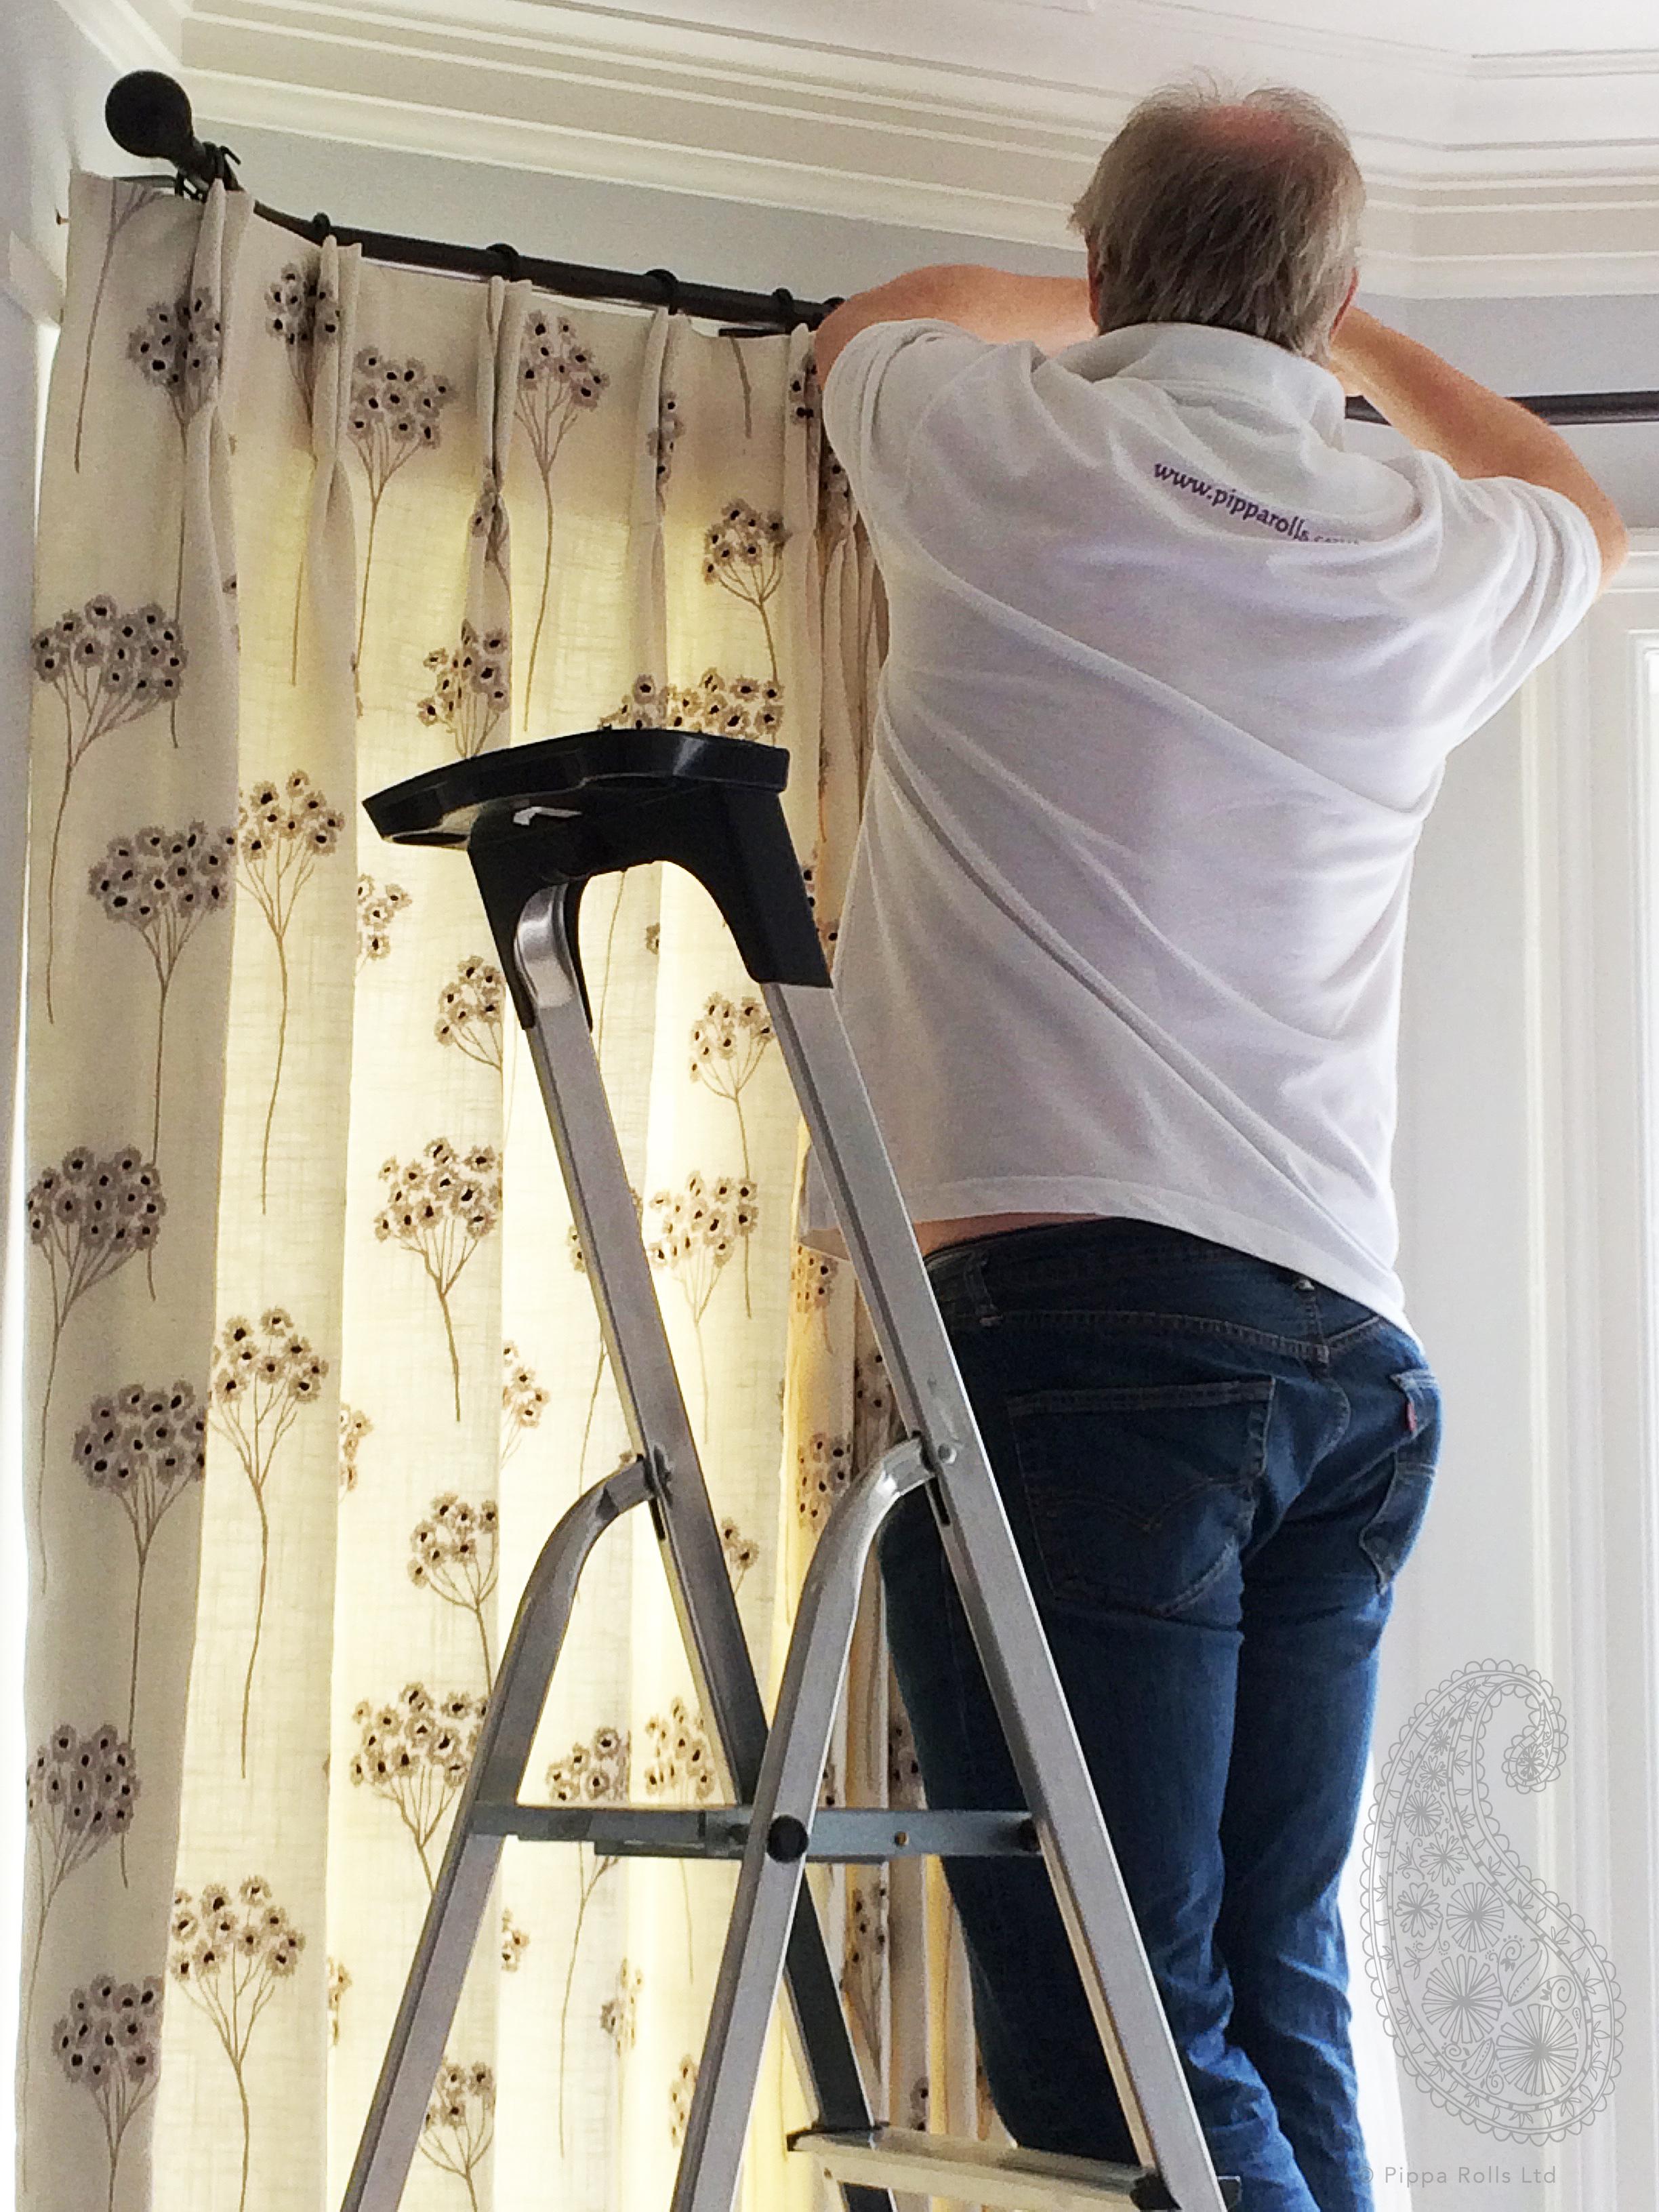 Curtain fitting for bay window. Pippa Rolls Limited jpeg.jpg